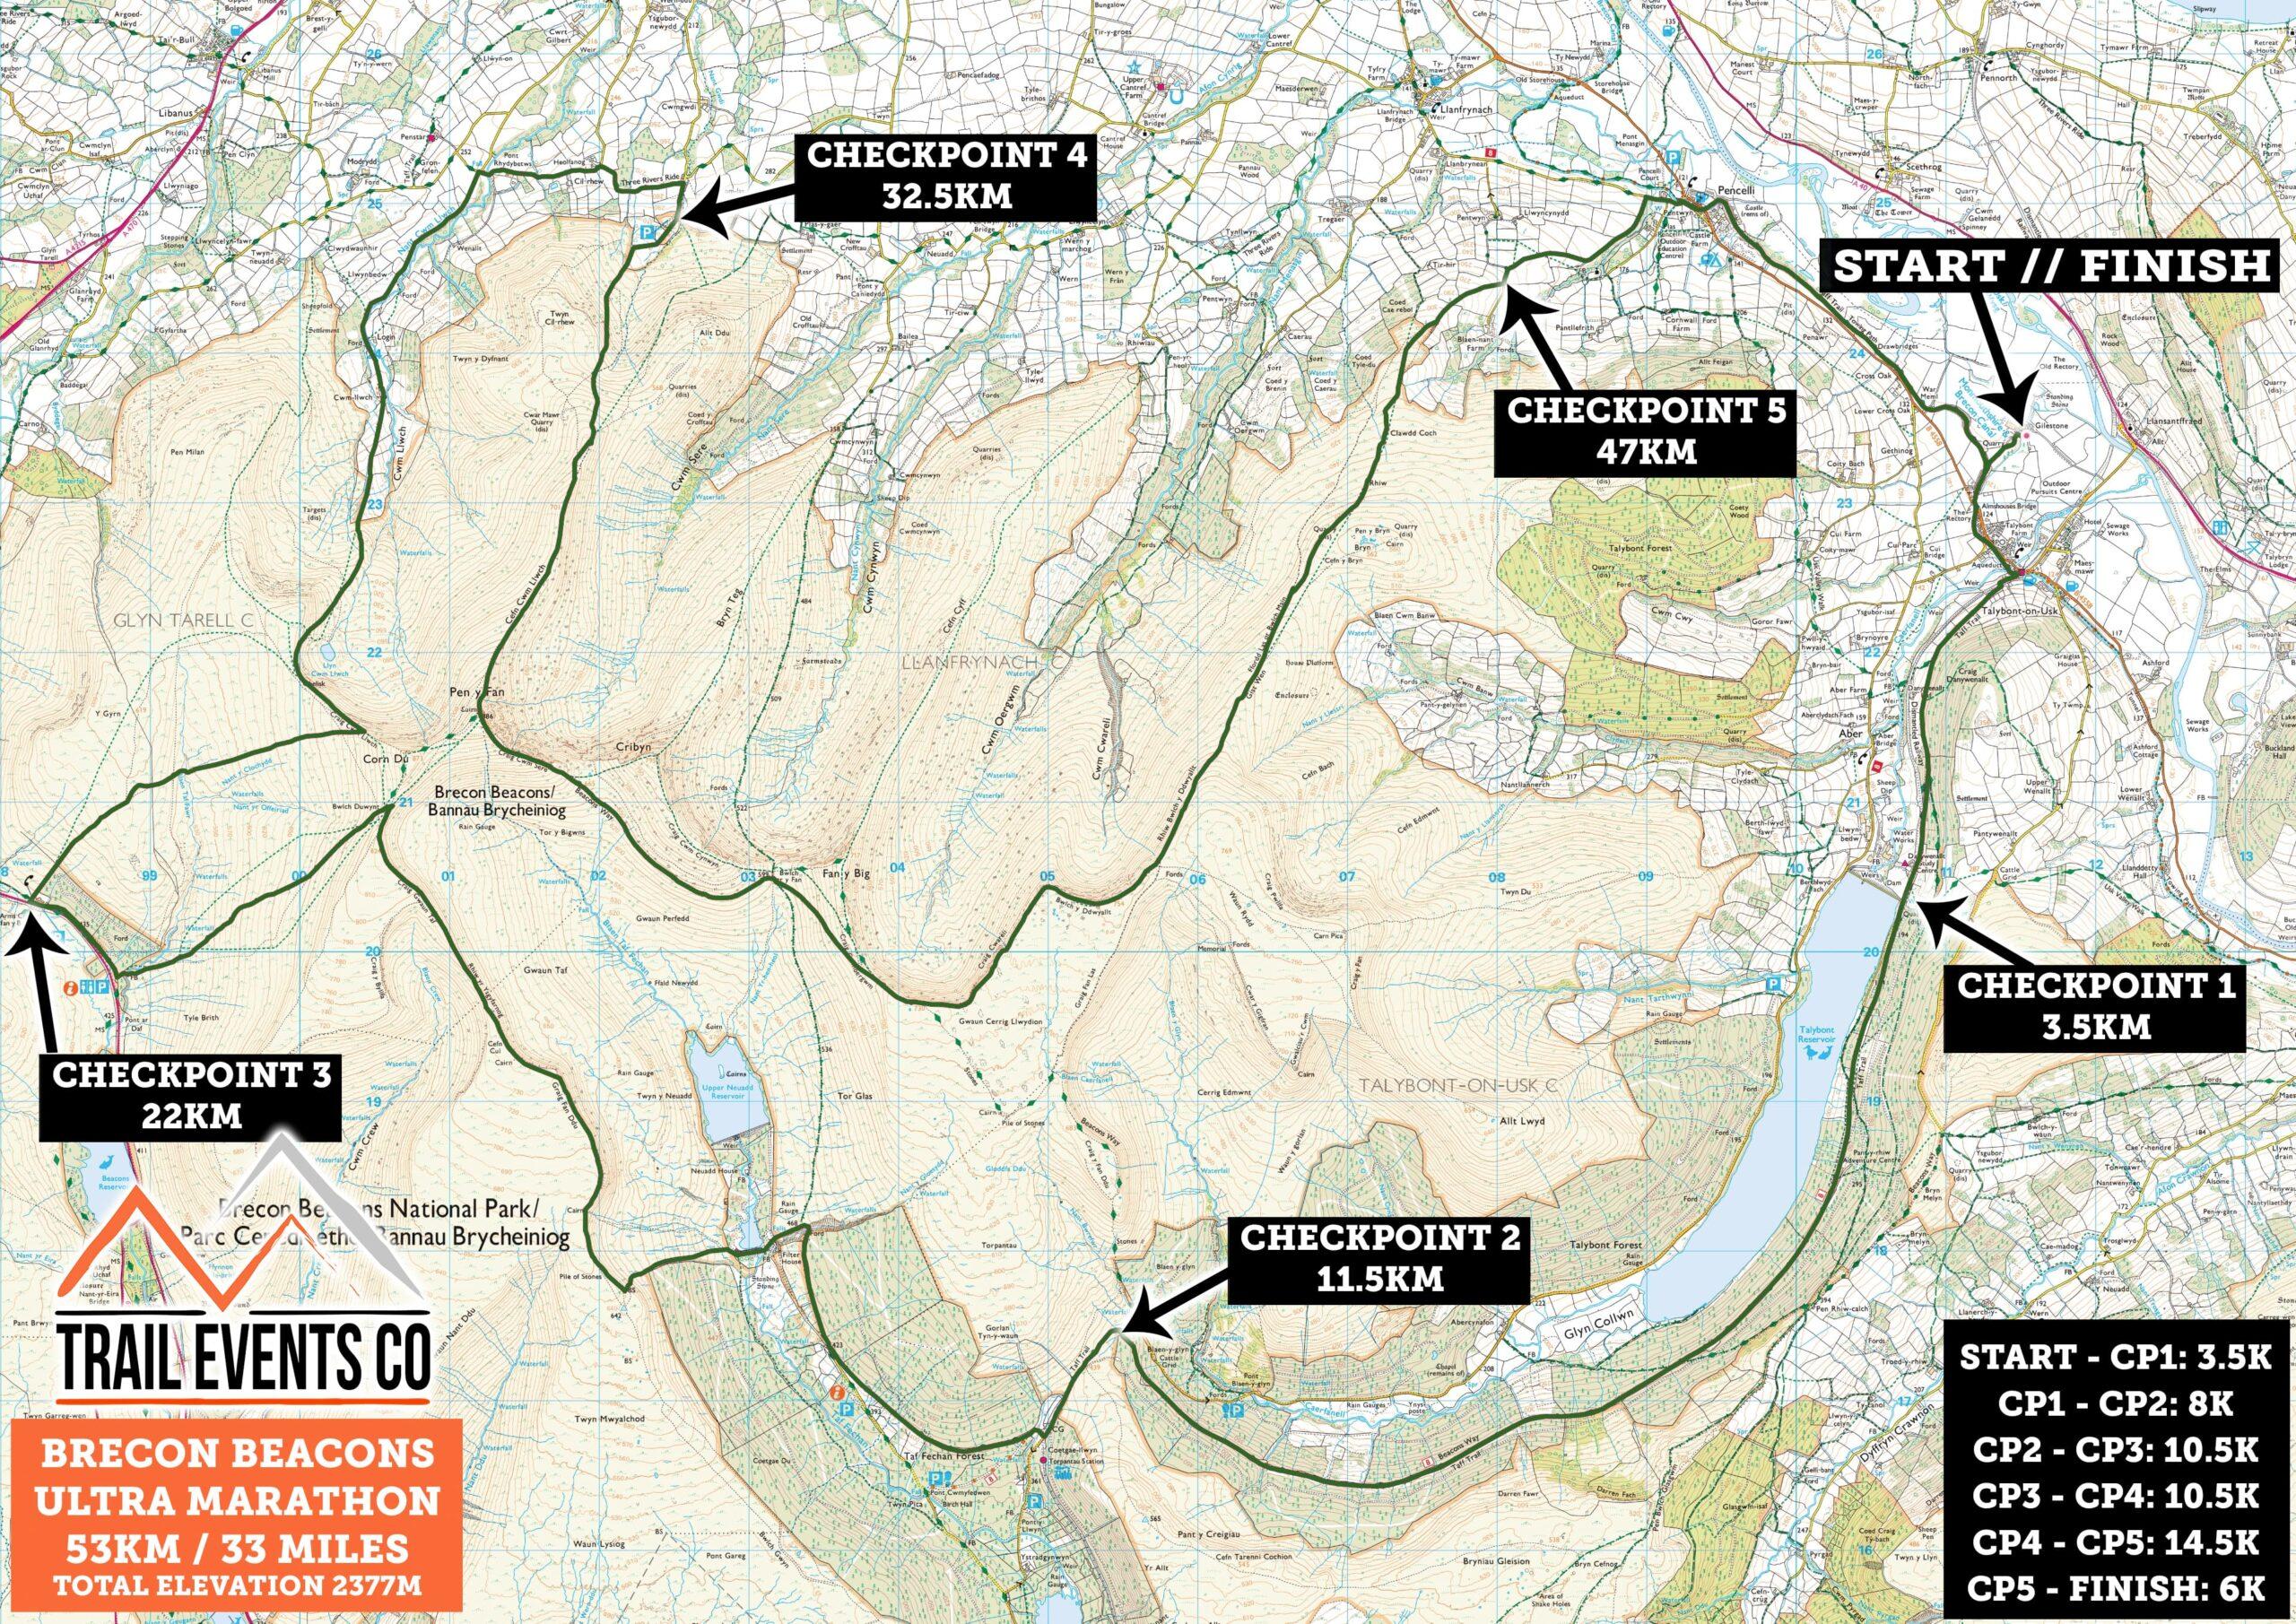 Brecon Beacons Ultra Marathon